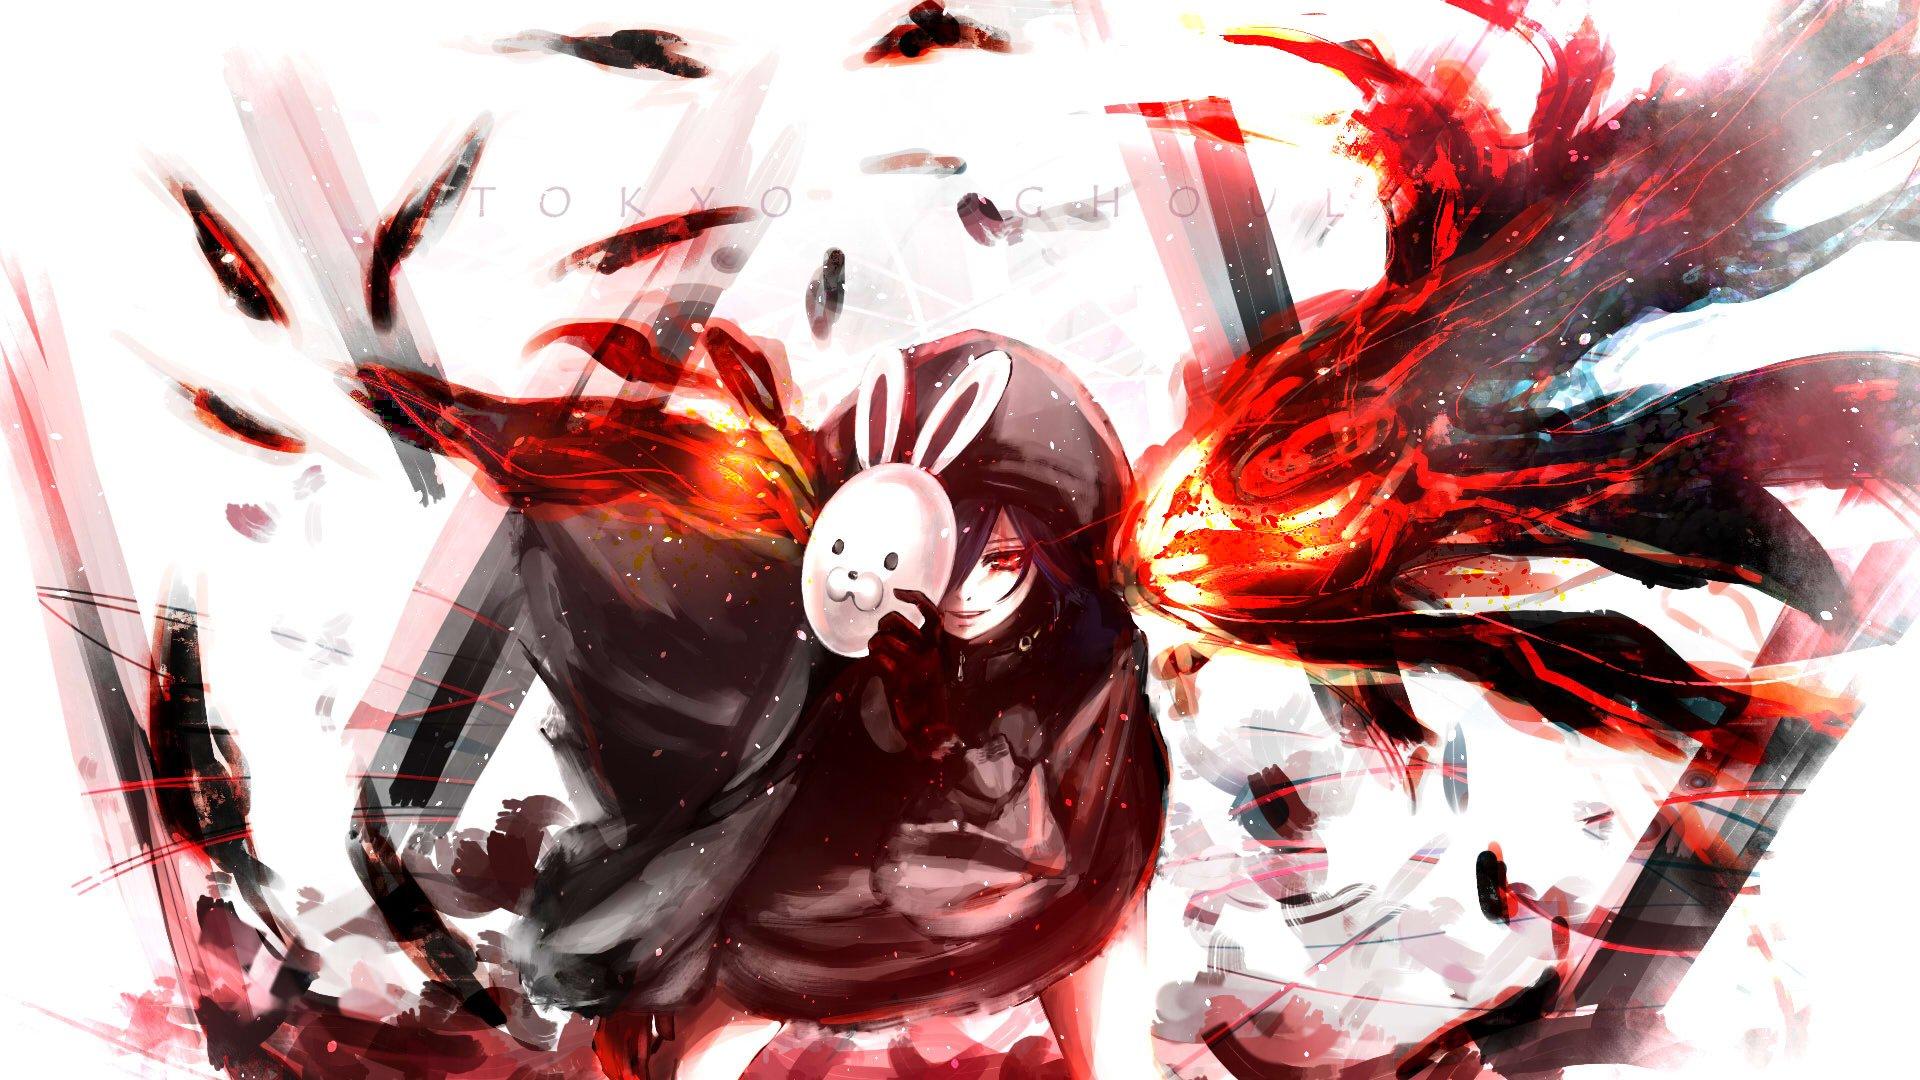 259 Touka Kirishima Hd Wallpapers Background Images Wallpaper Abyss